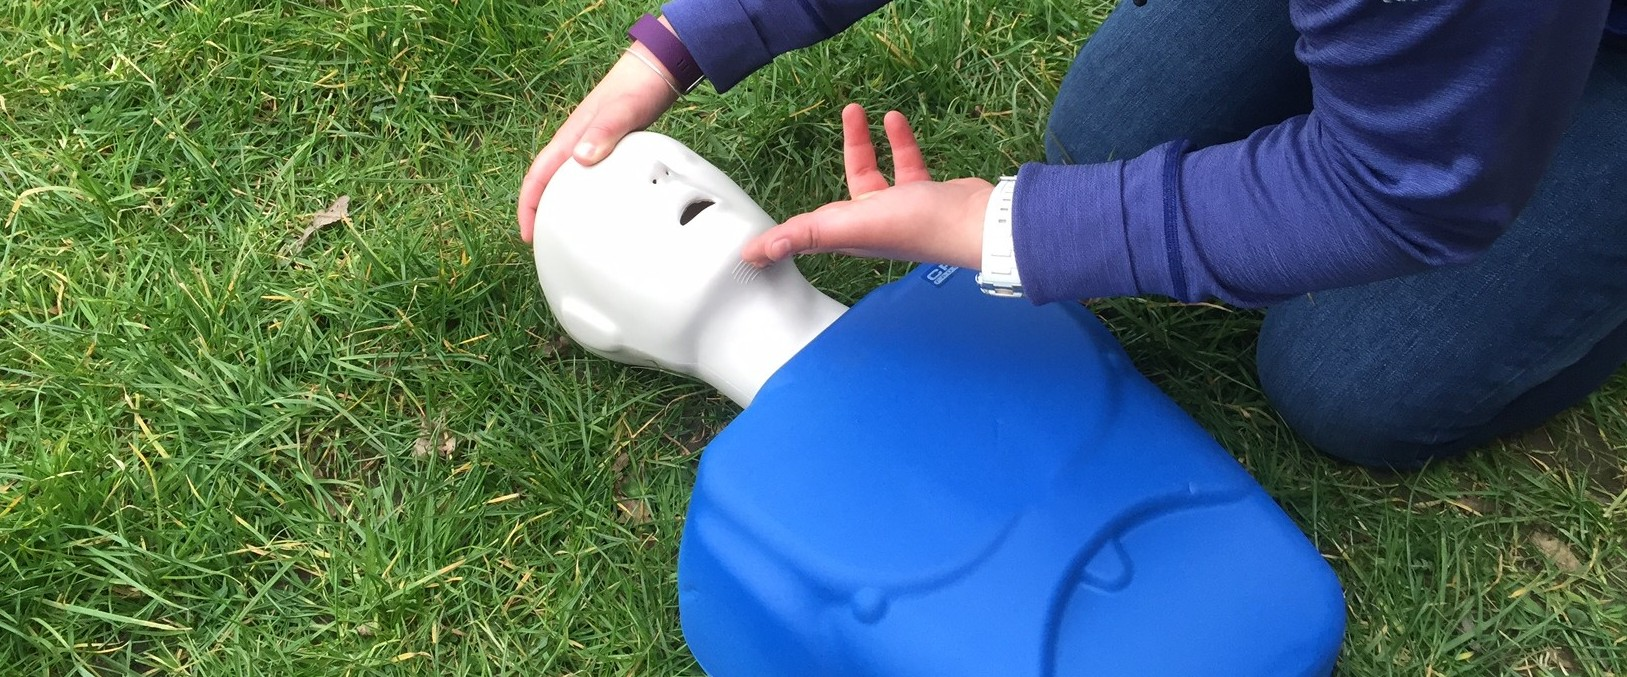 https://www.theadventurebrand.co.uk/first-aid/